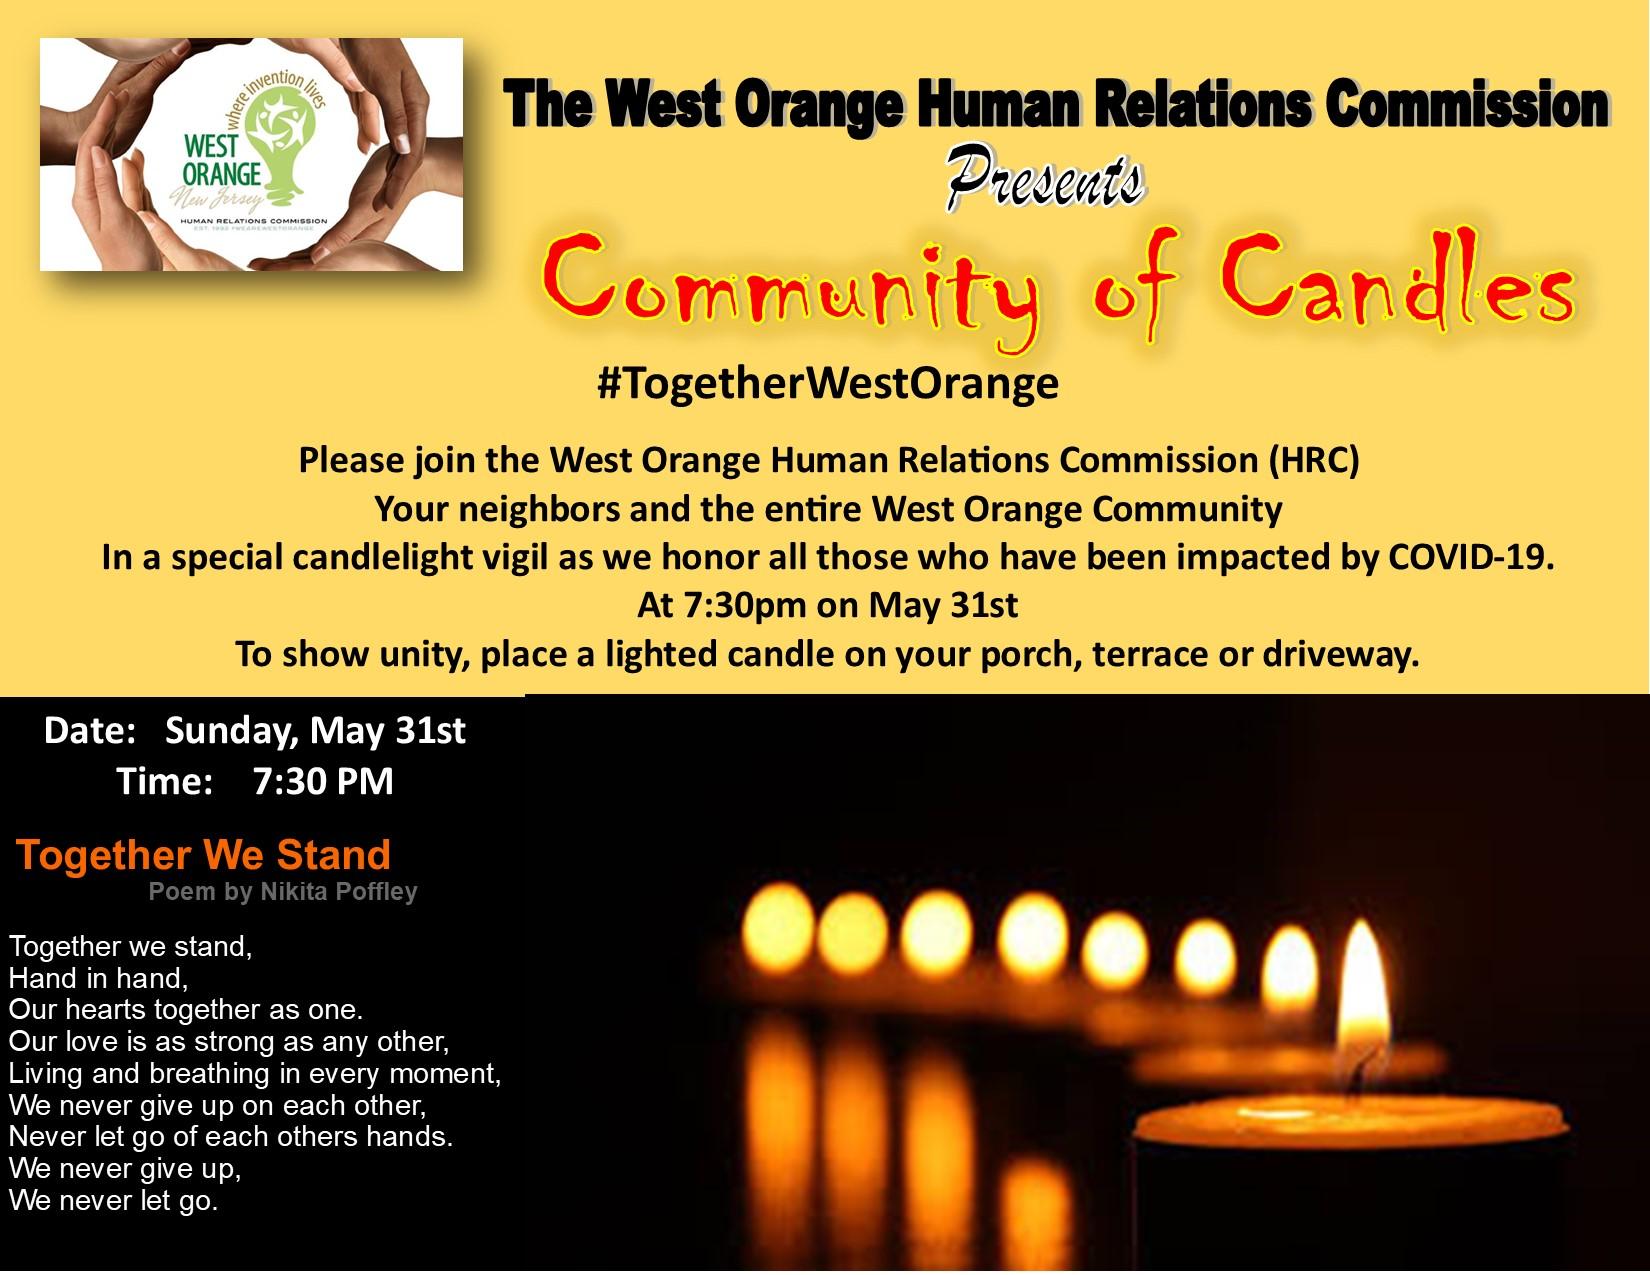 Community Candles